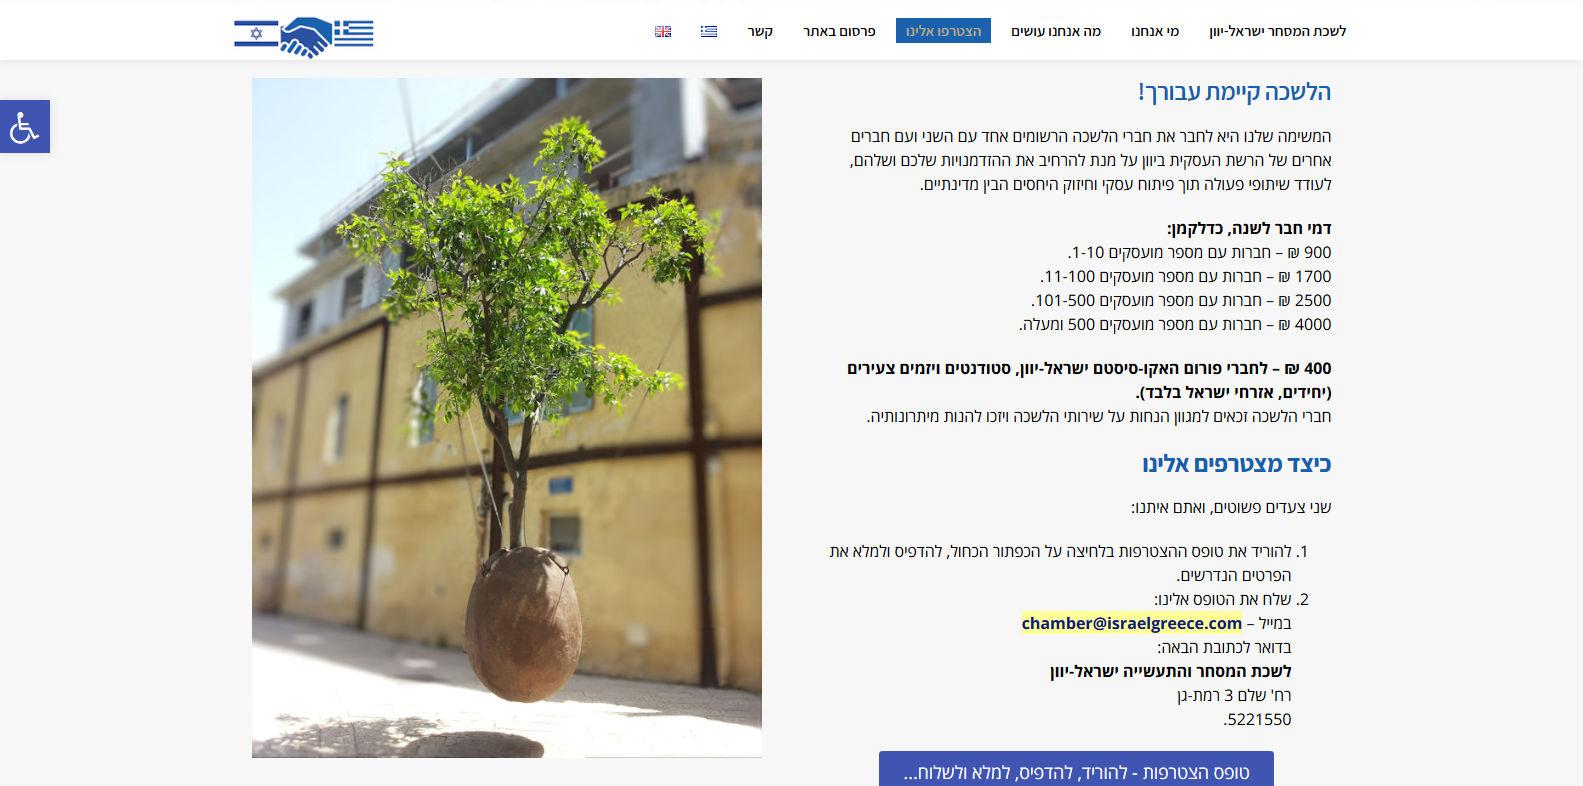 israelgreece-join-h